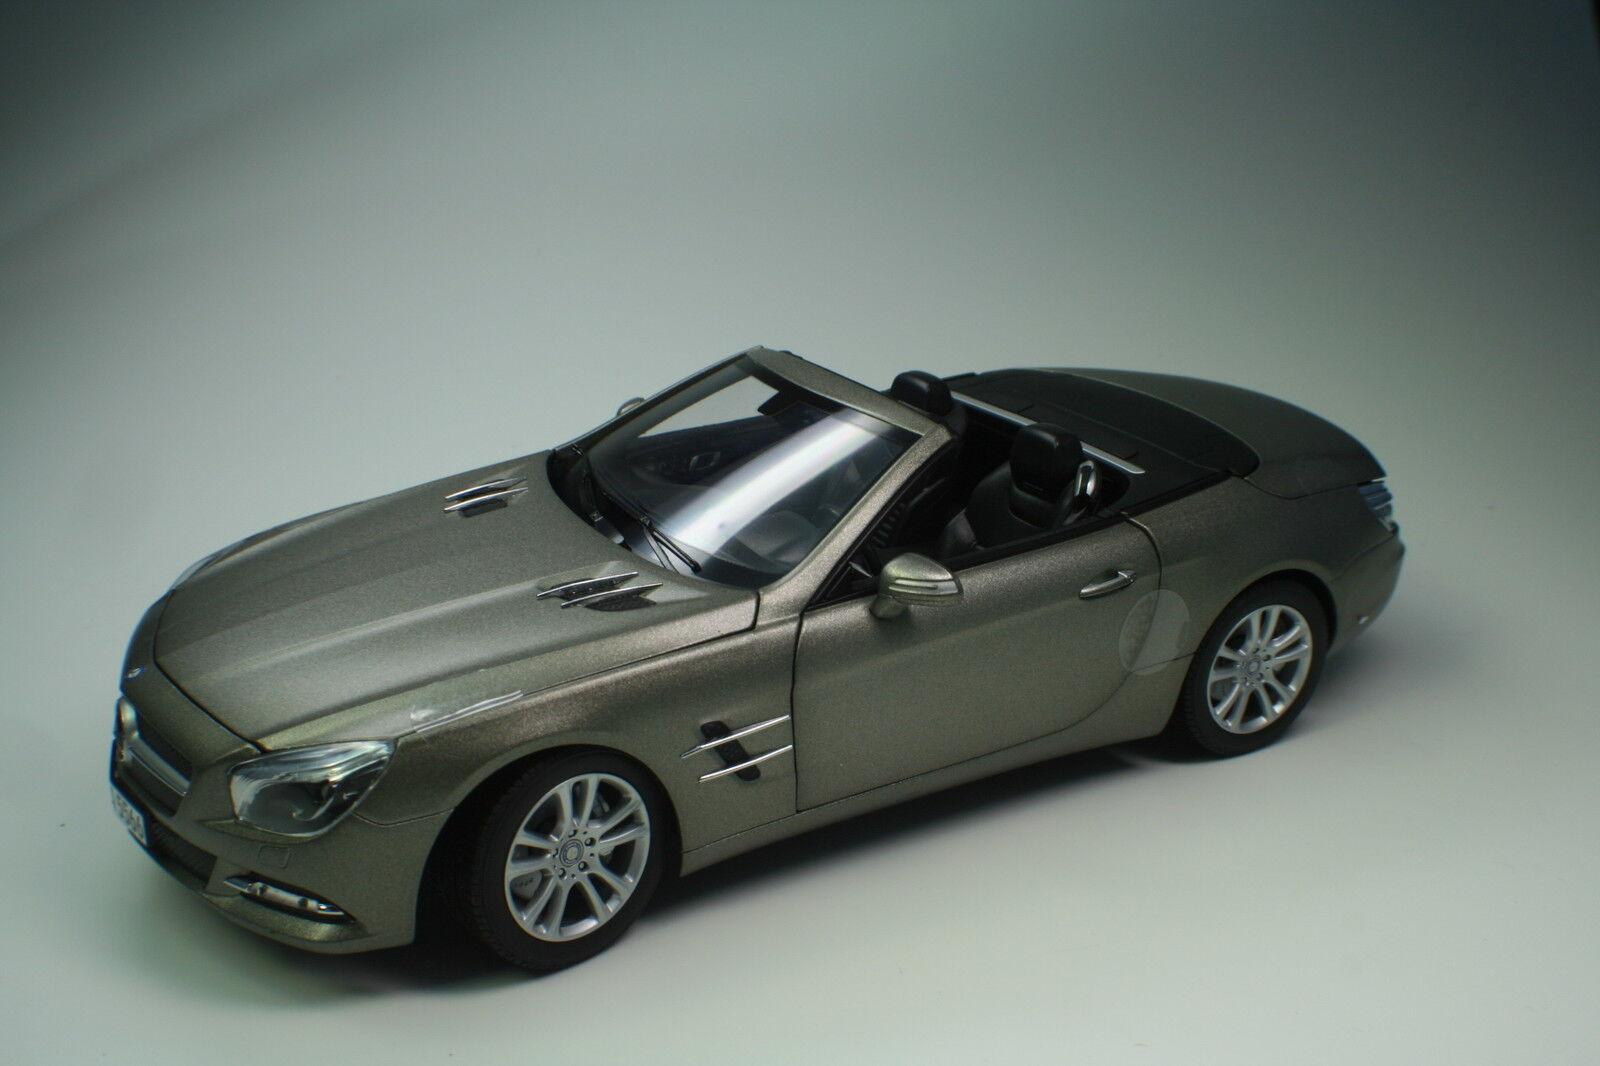 Mercedes-benz sl 500 2012 dark gris Matt 182590 norev 1 18 nuevo embalaje original